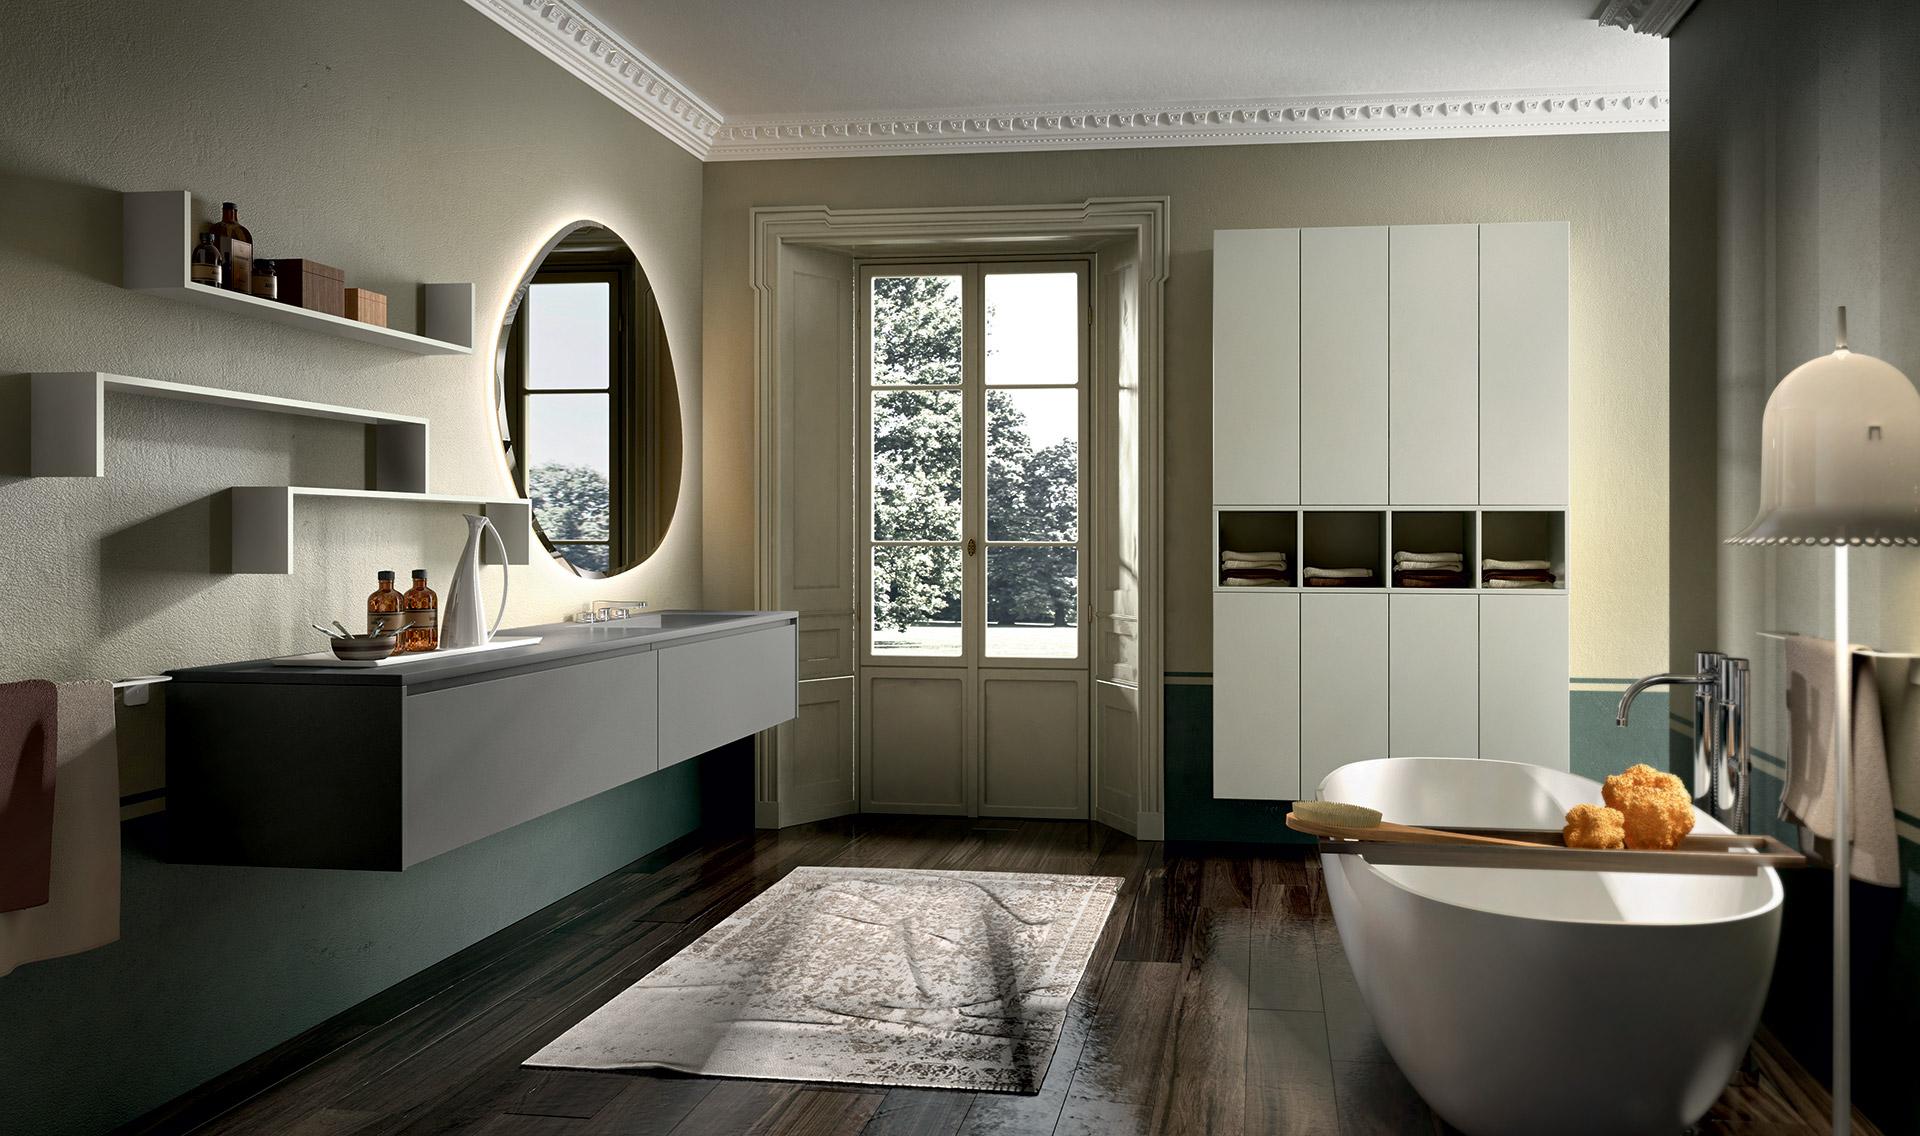 Eos aura concept cuisine salle de bain spa for Vendita mobili bagno